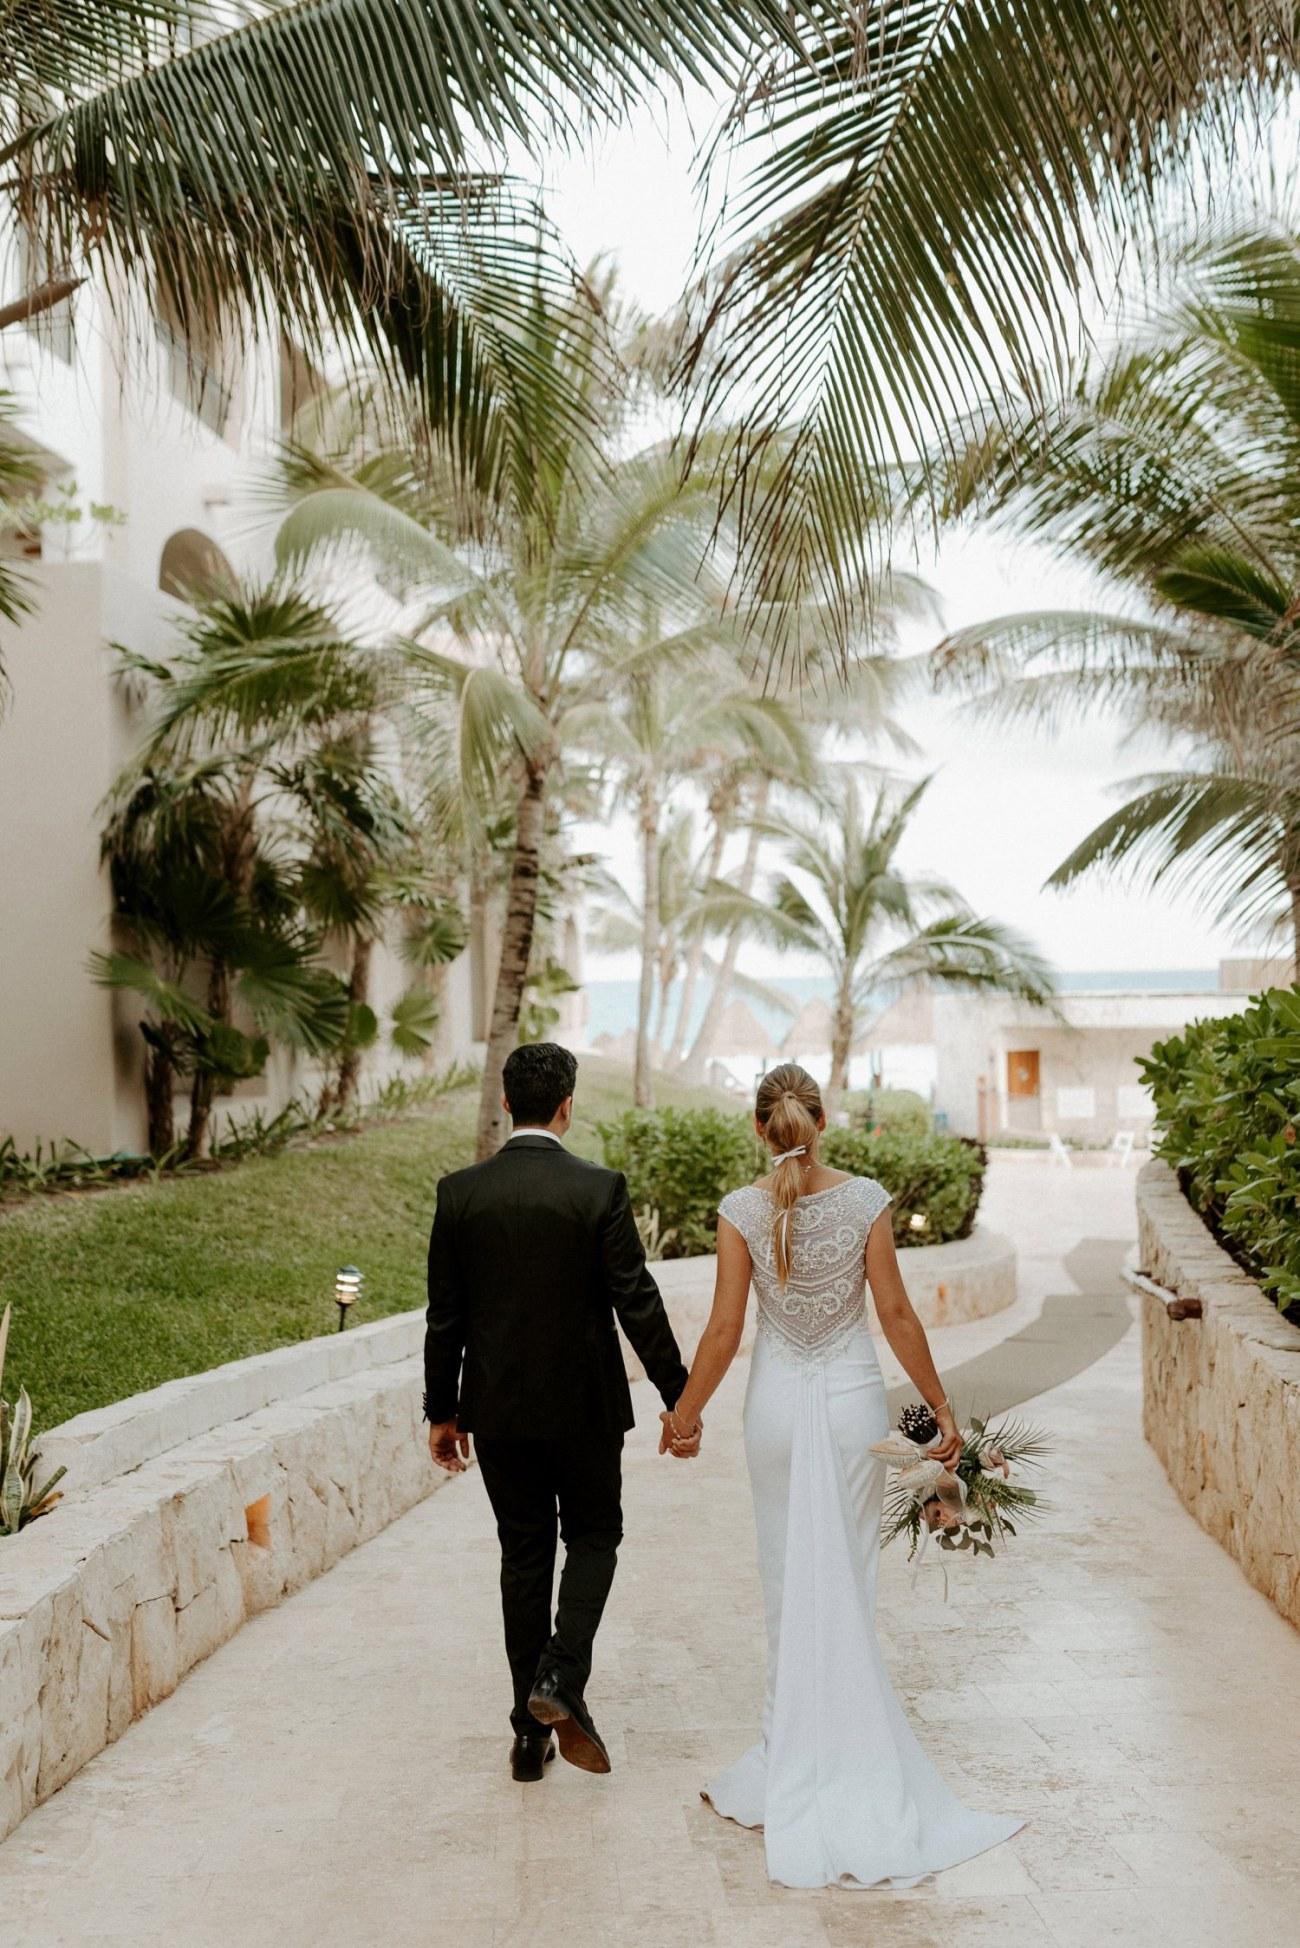 Cancun Destination Wedding Mexico Tulum Wedding Photographer Anais Possamai Photography 060